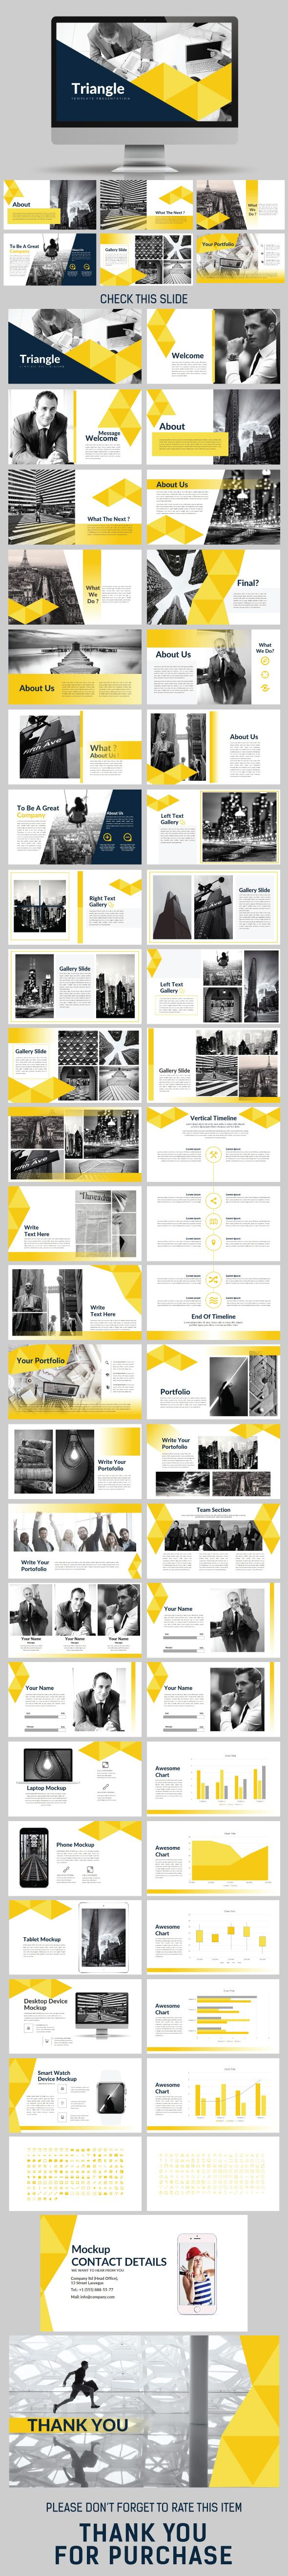 Triangle - PowerPoint Templates - Unique 50 Custom Slides